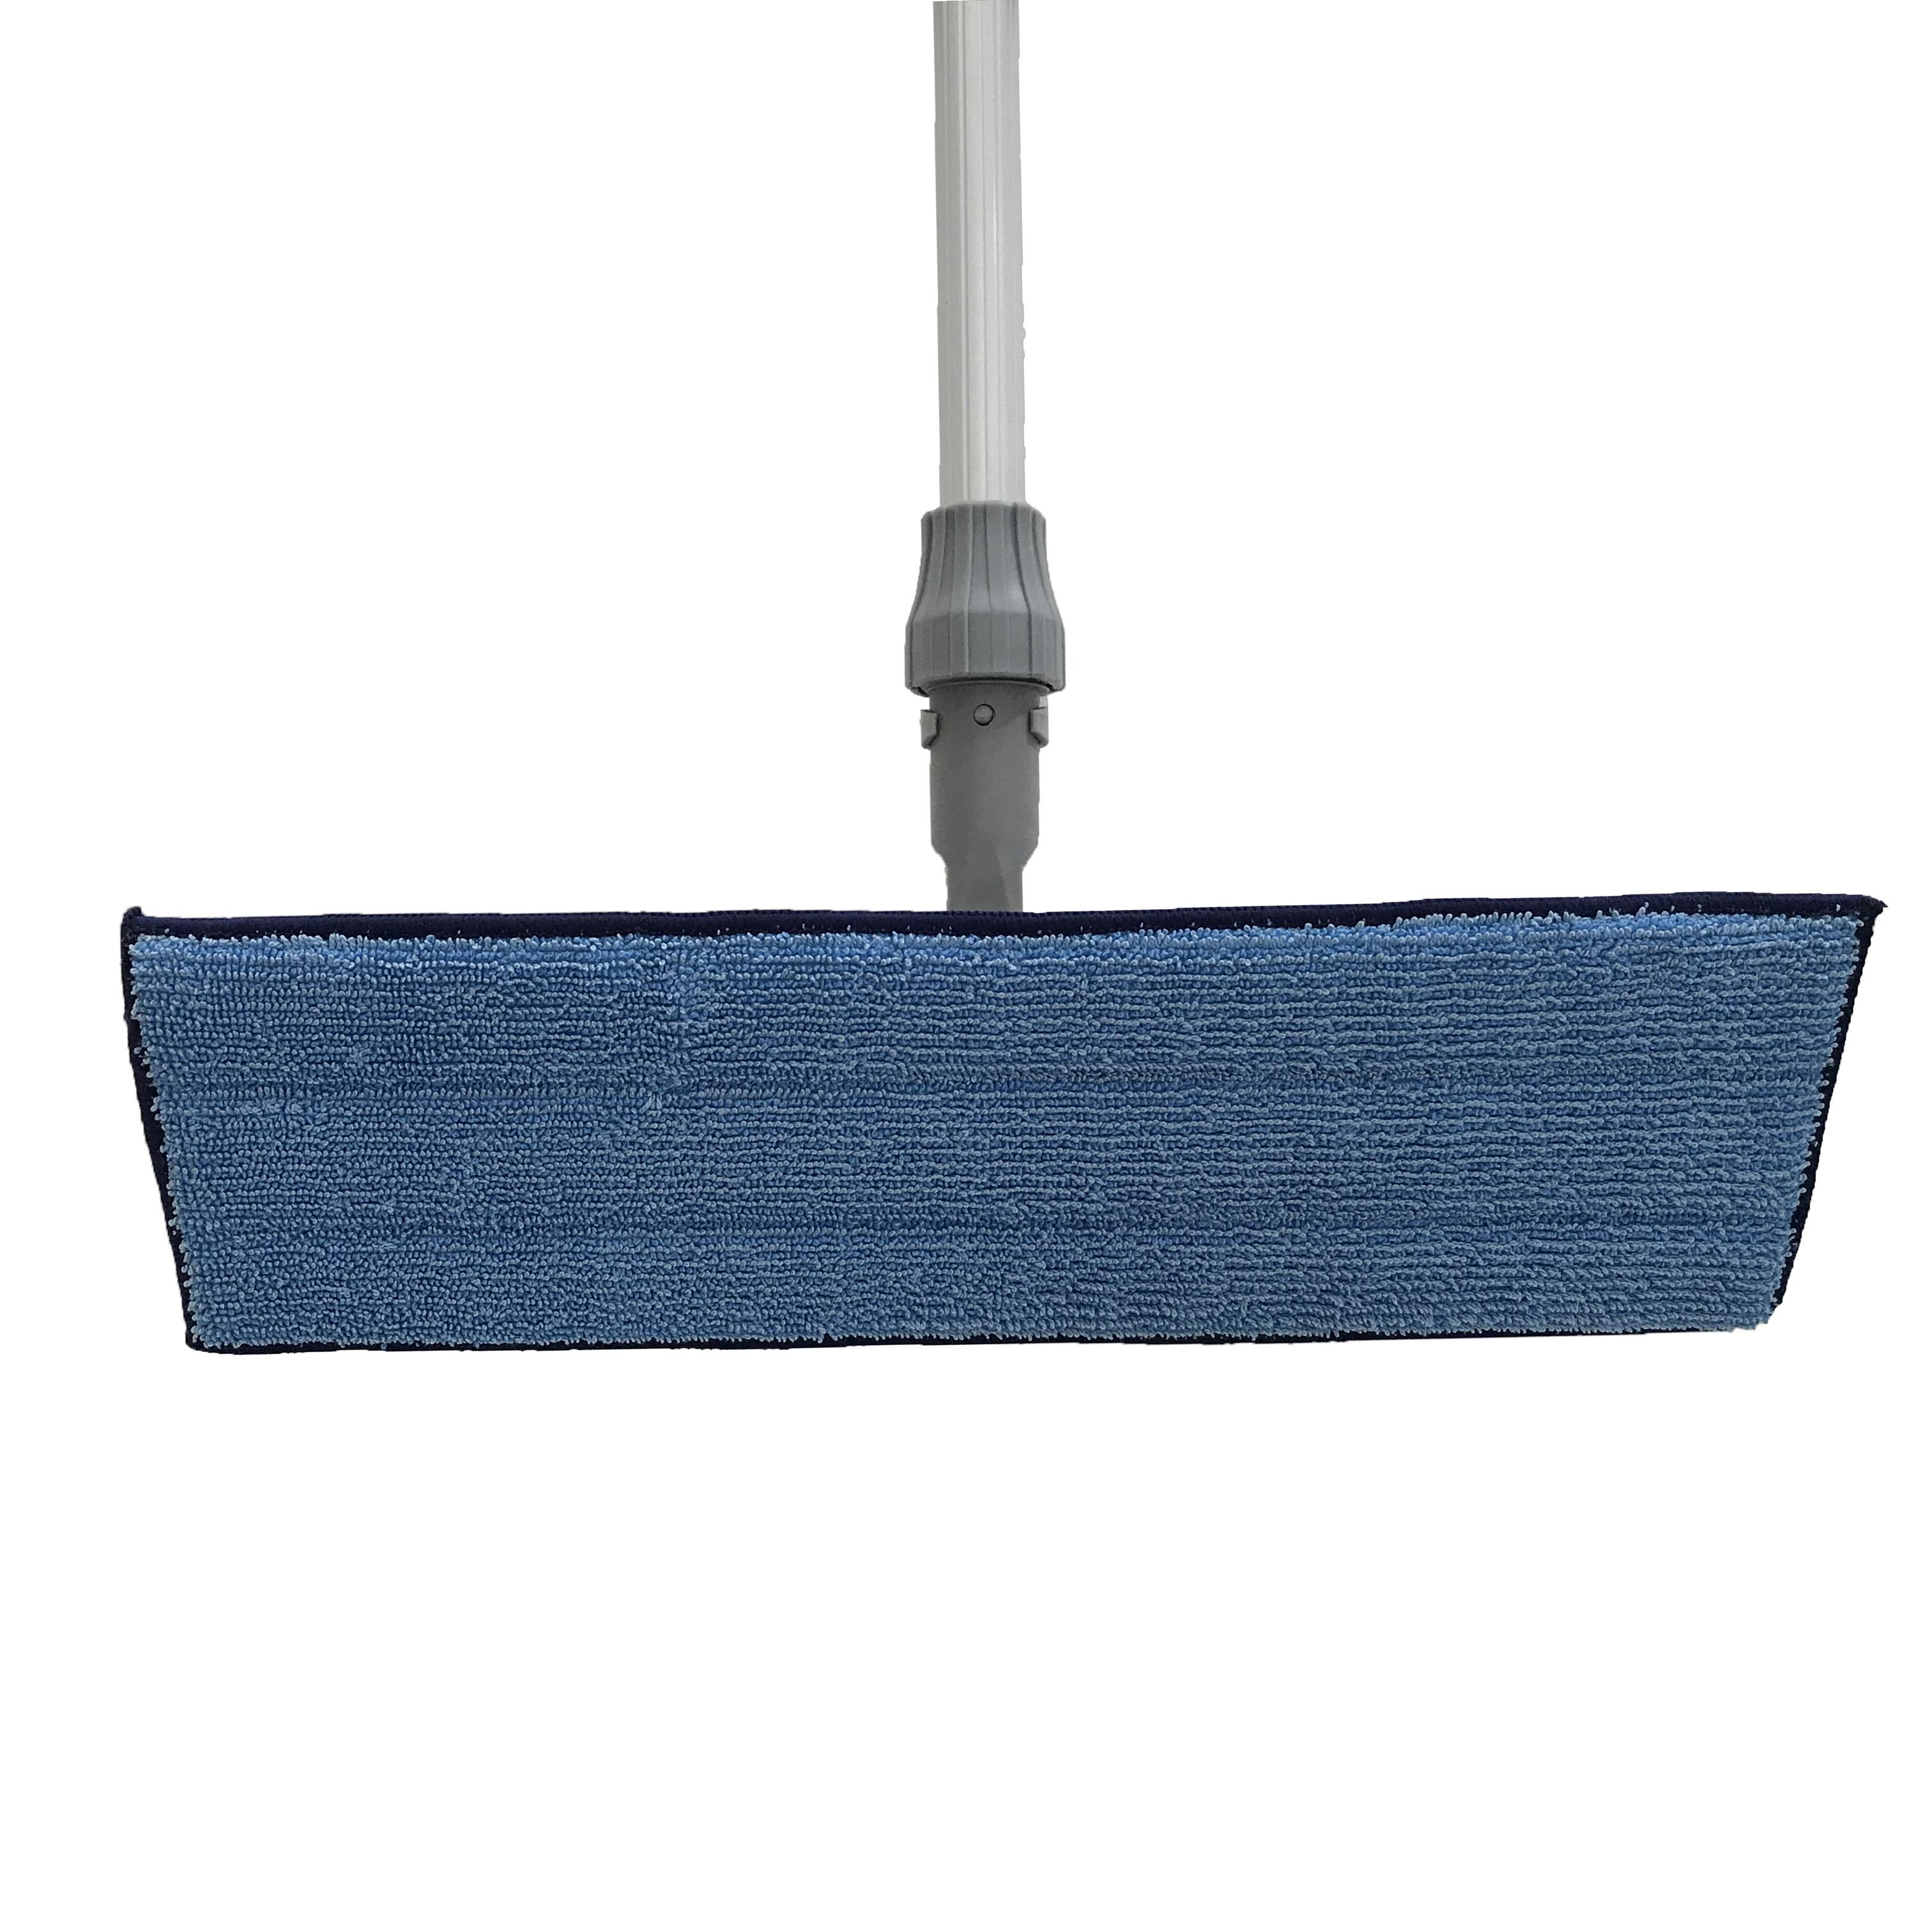 set of 2 Aluminum Dust Mop Handle